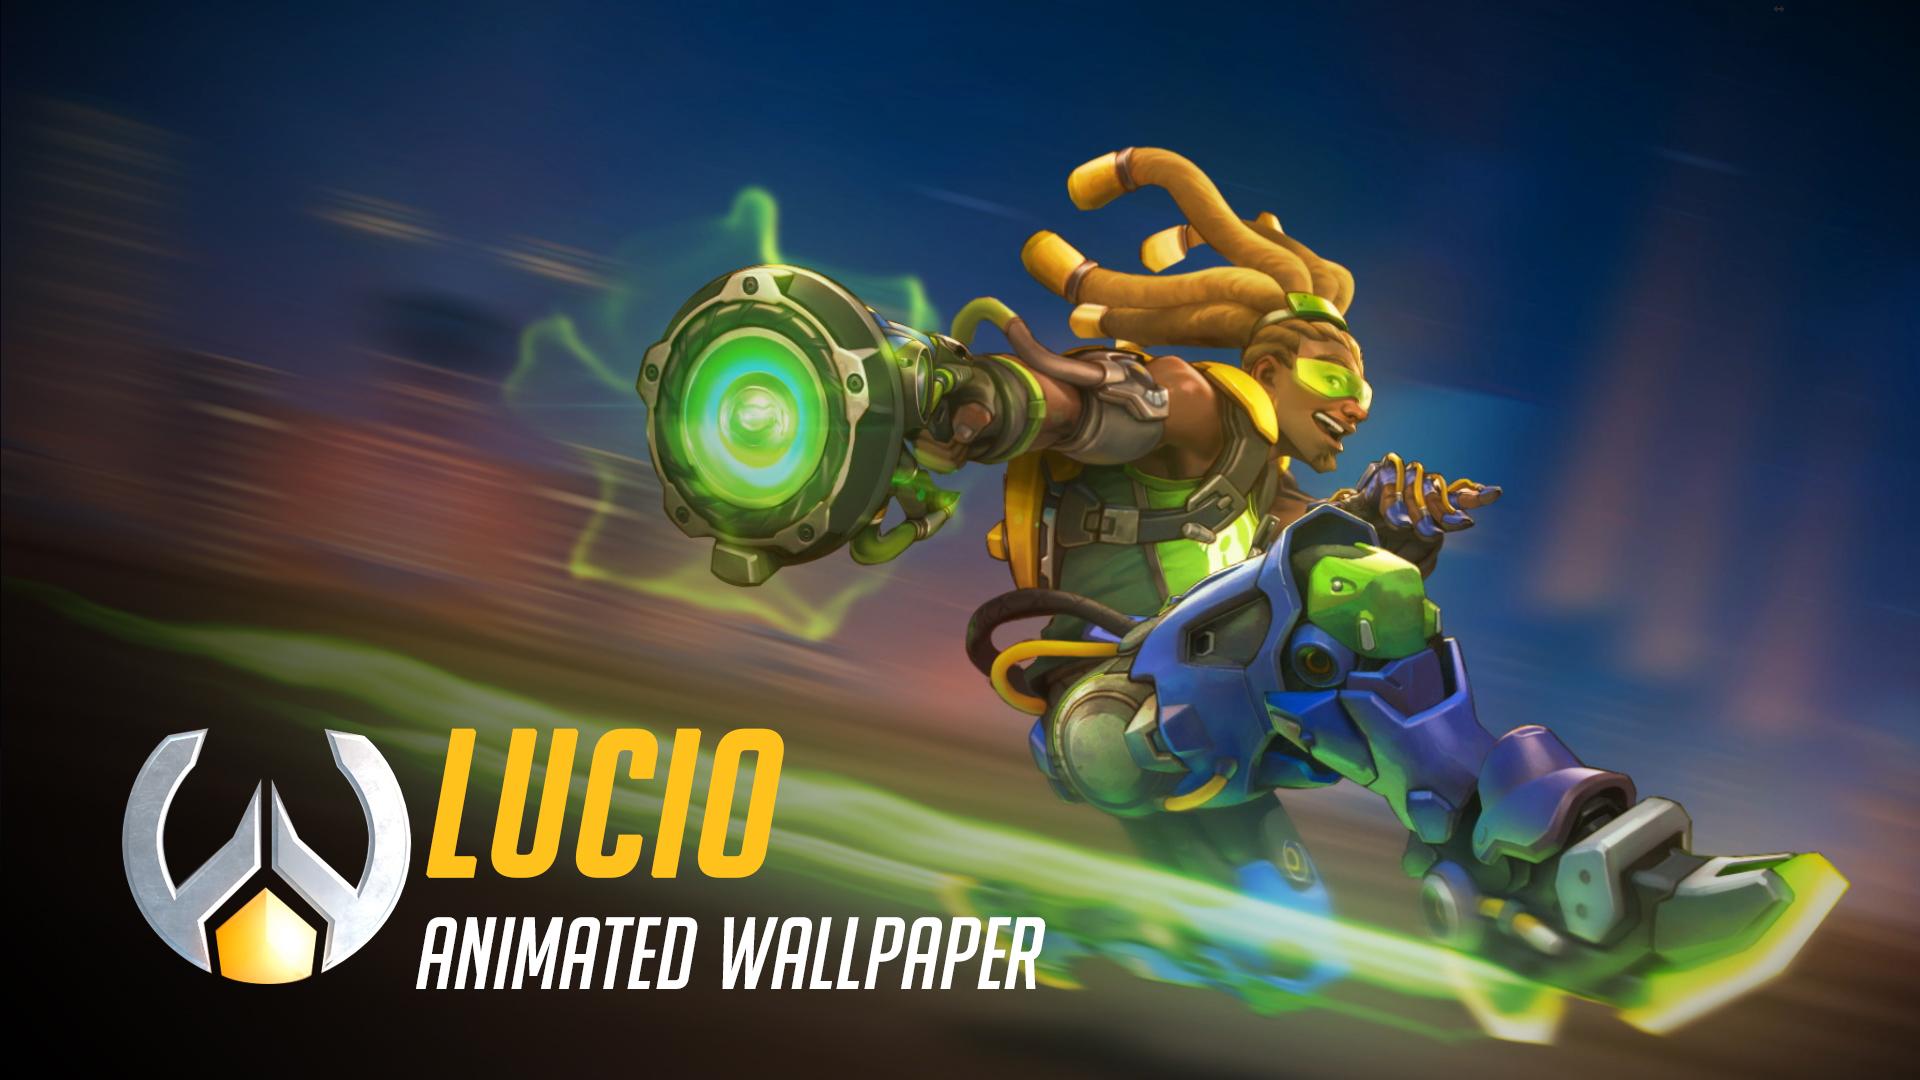 живые обои Lucio Animated Wallpaper Overwatch